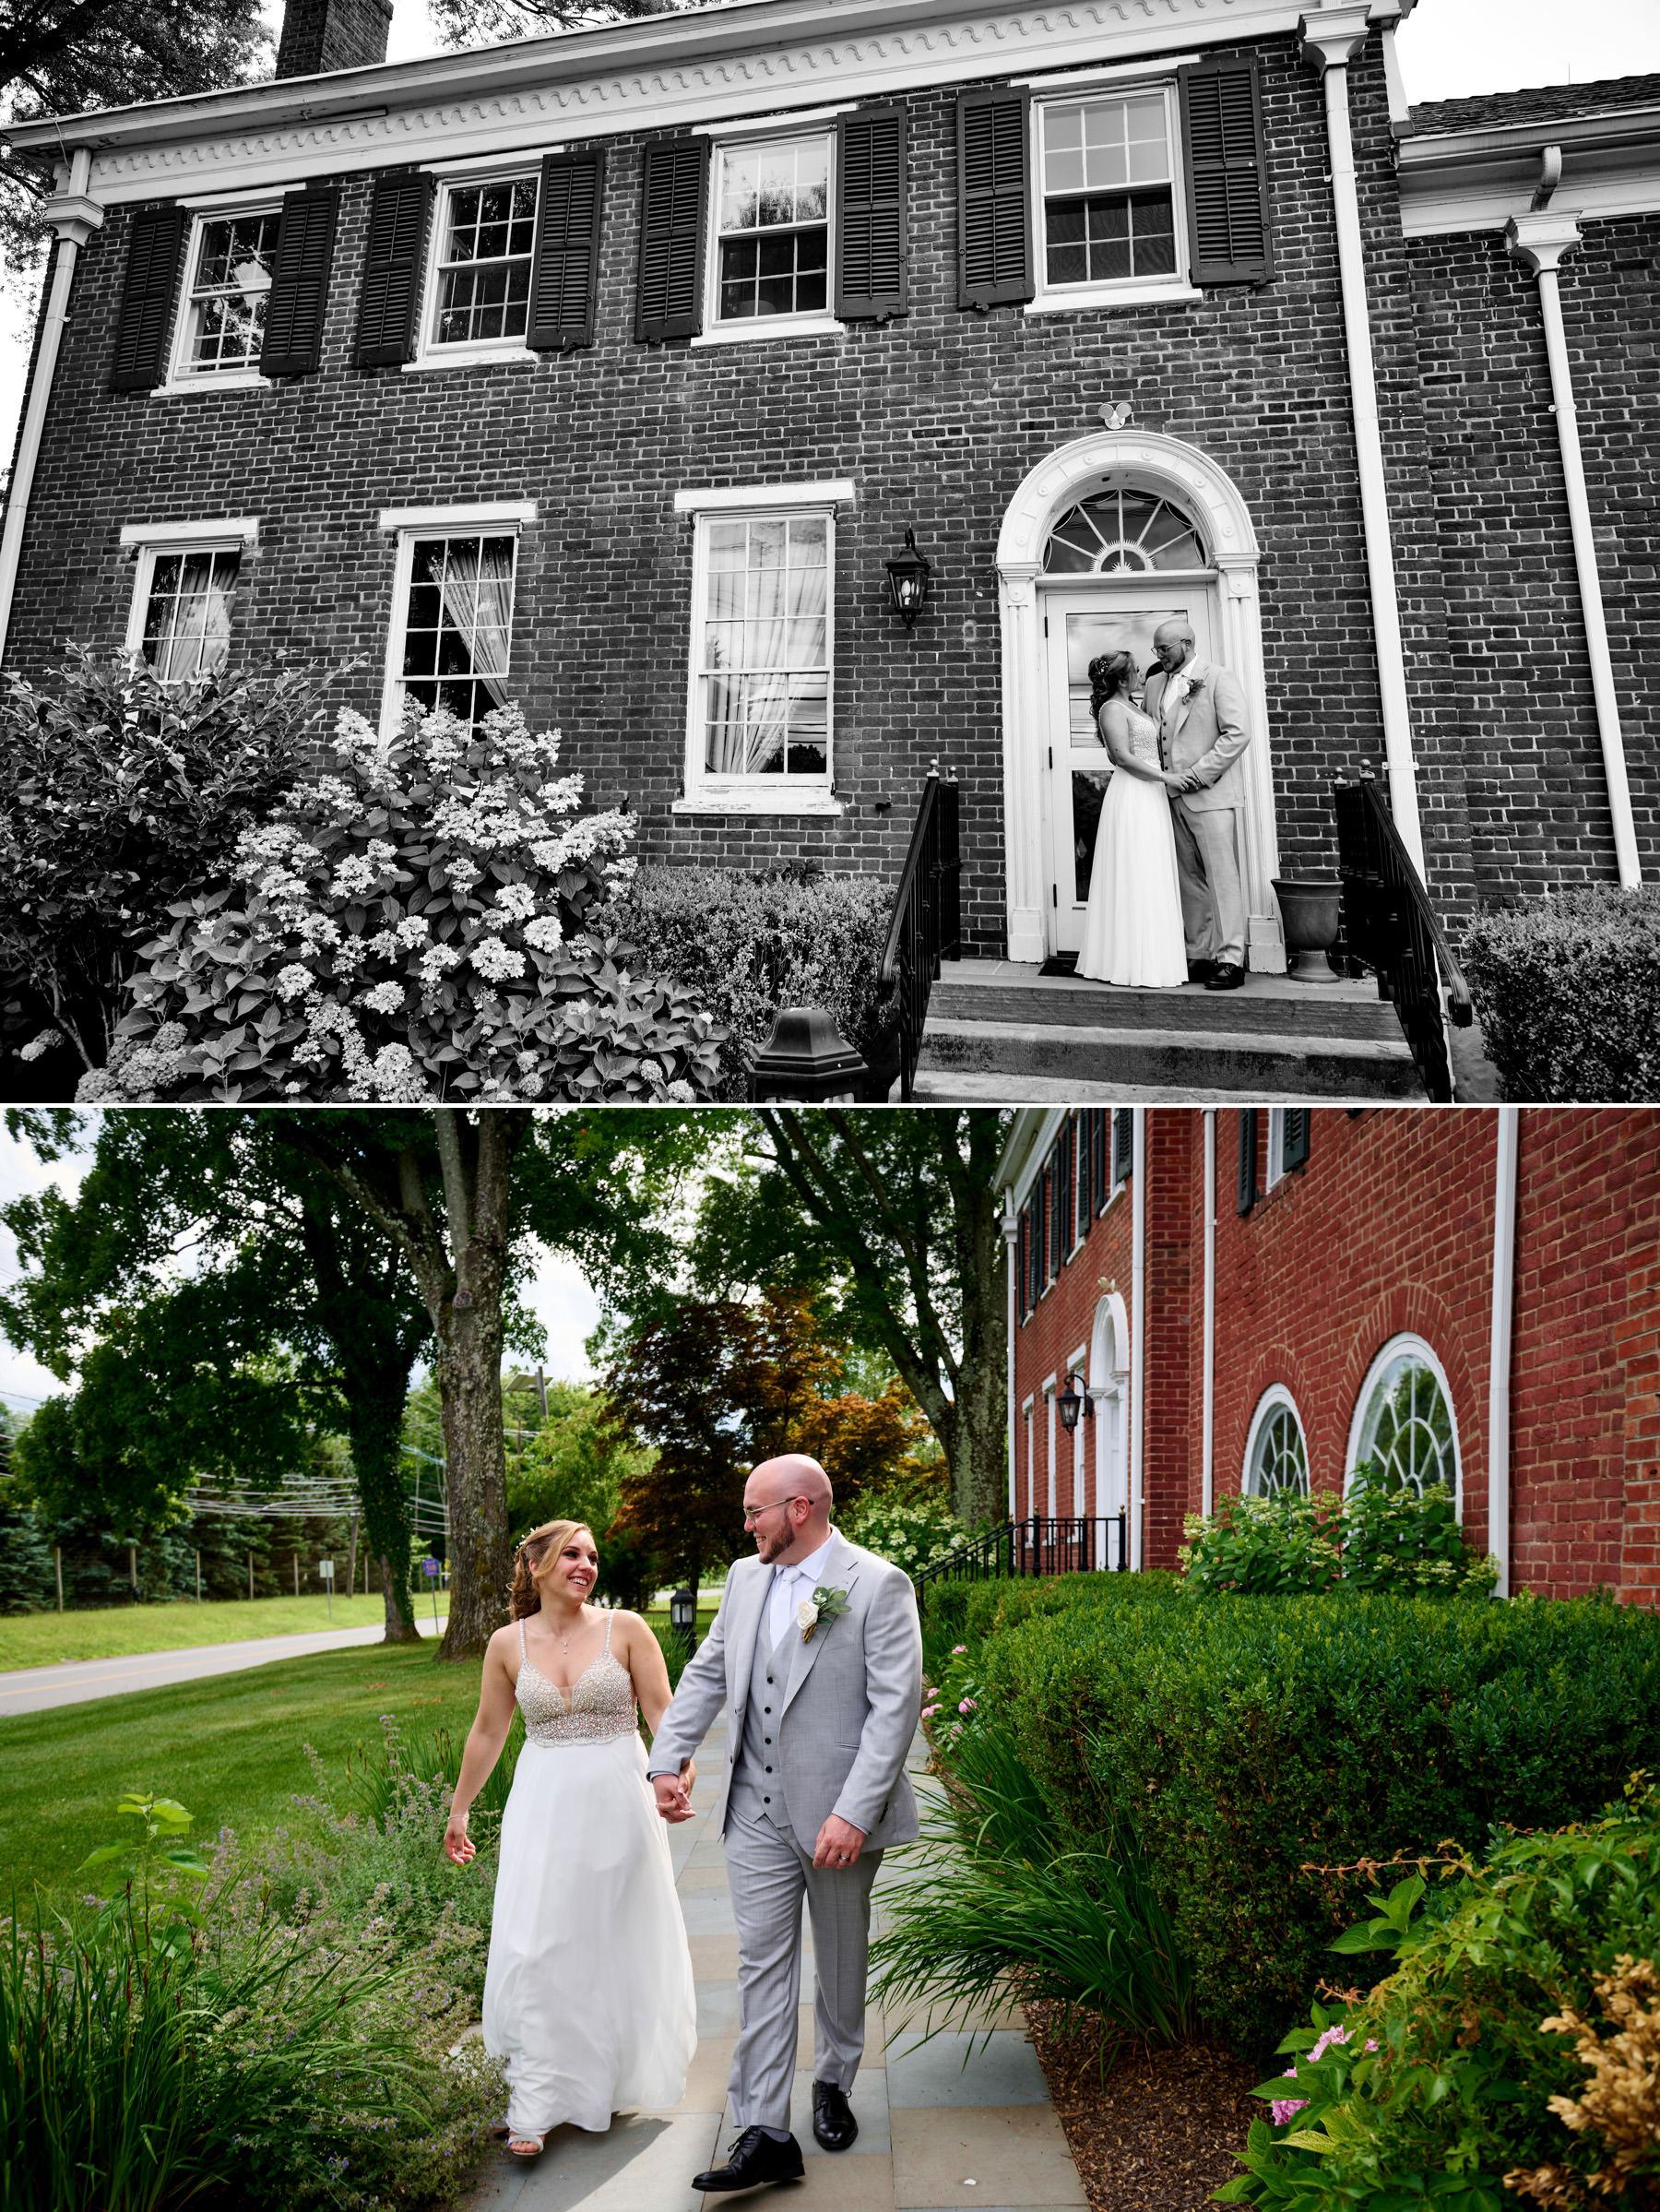 wedding photos in front of Brick Farm Tavern